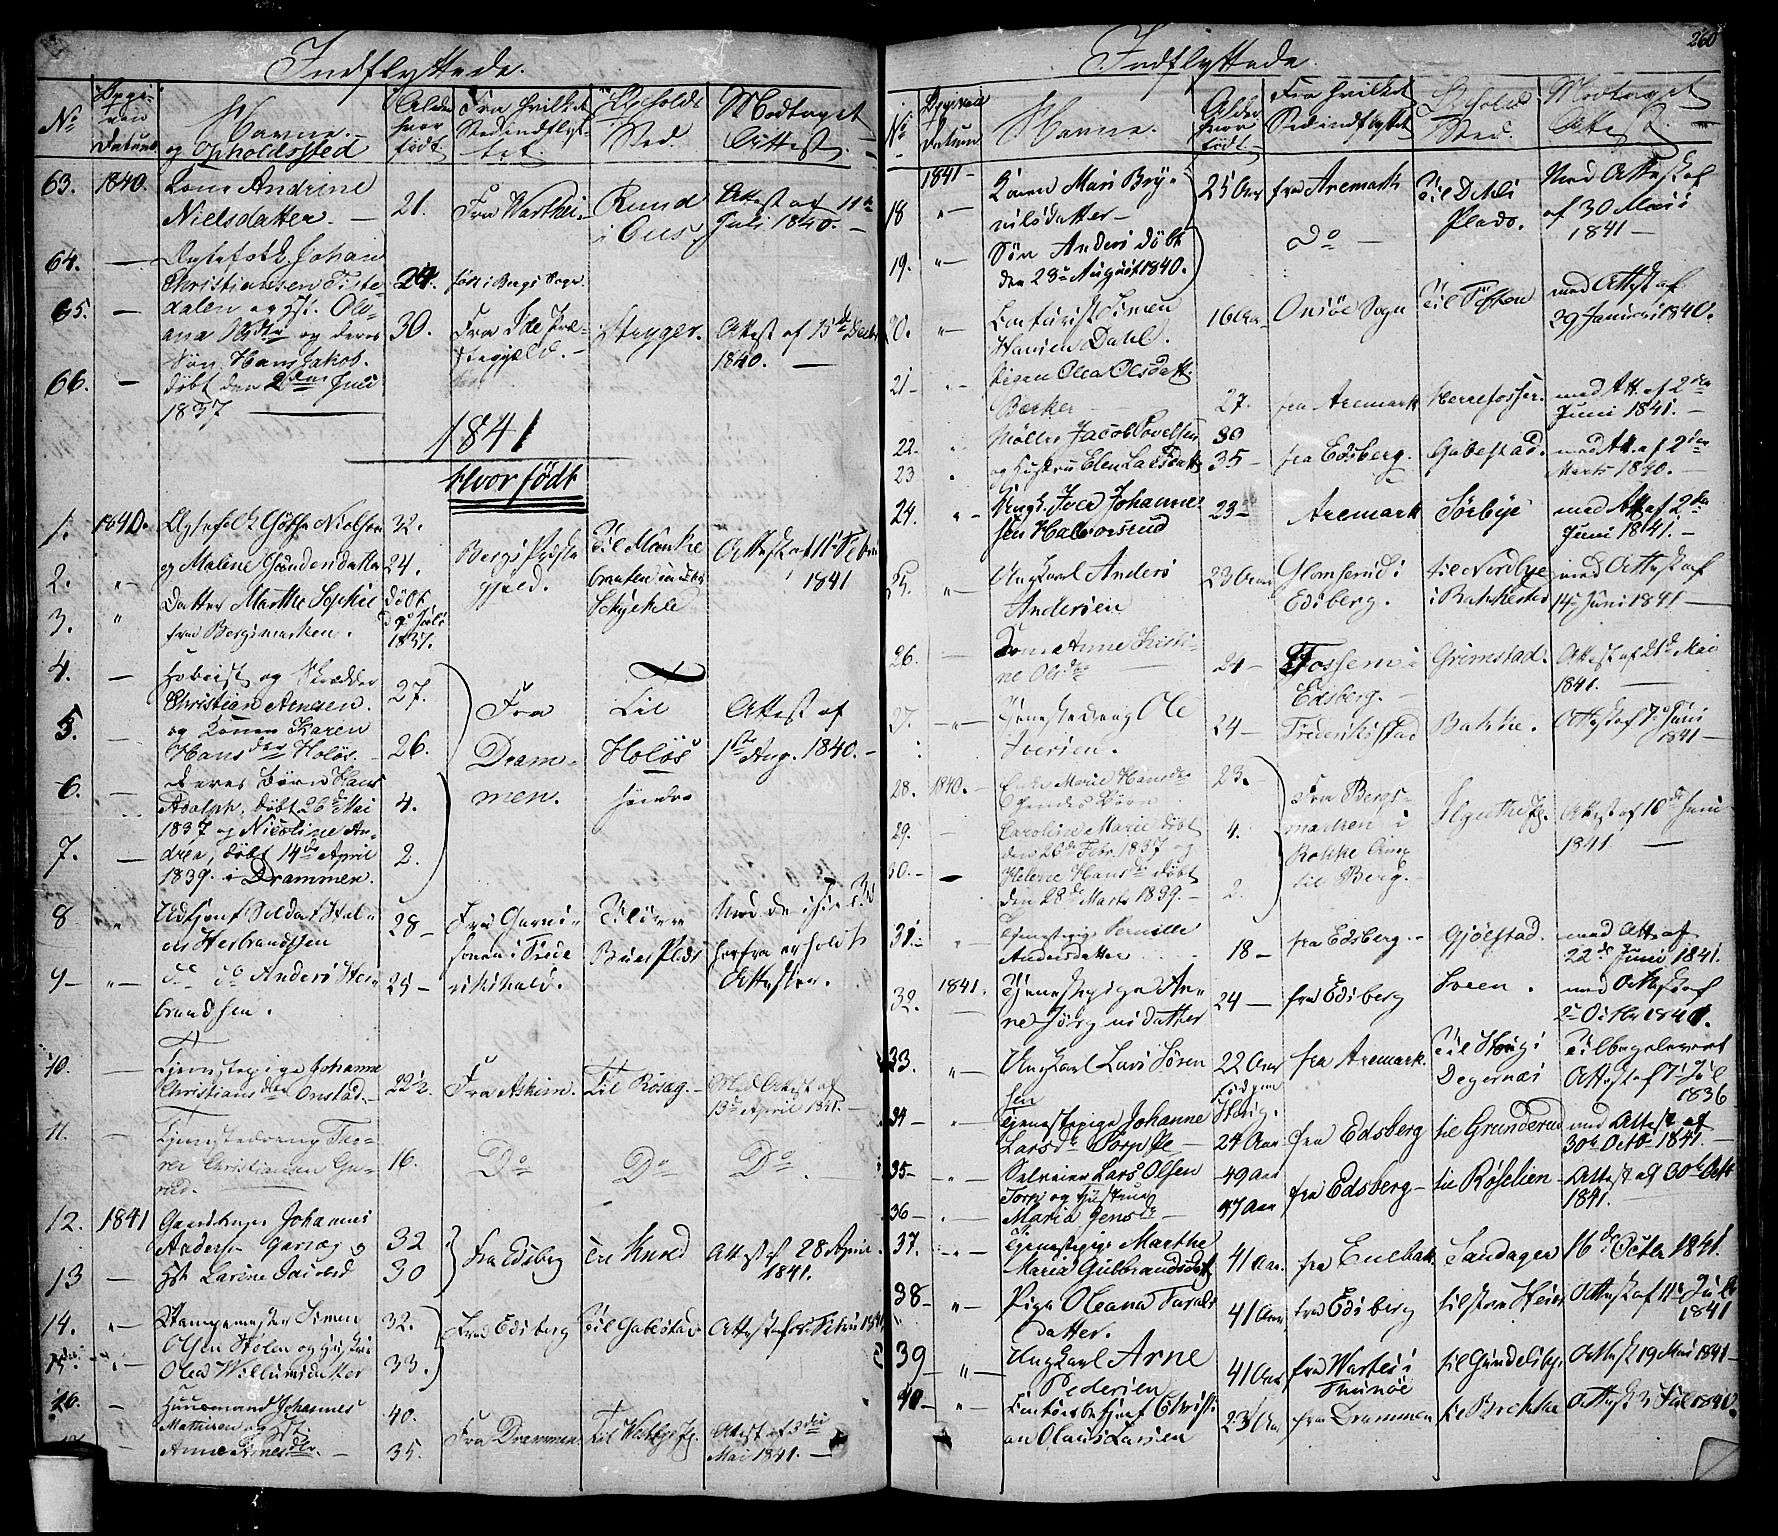 SAO, Rakkestad prestekontor Kirkebøker, F/Fa/L0007: Parish register (official) no. I 7, 1825-1841, p. 260